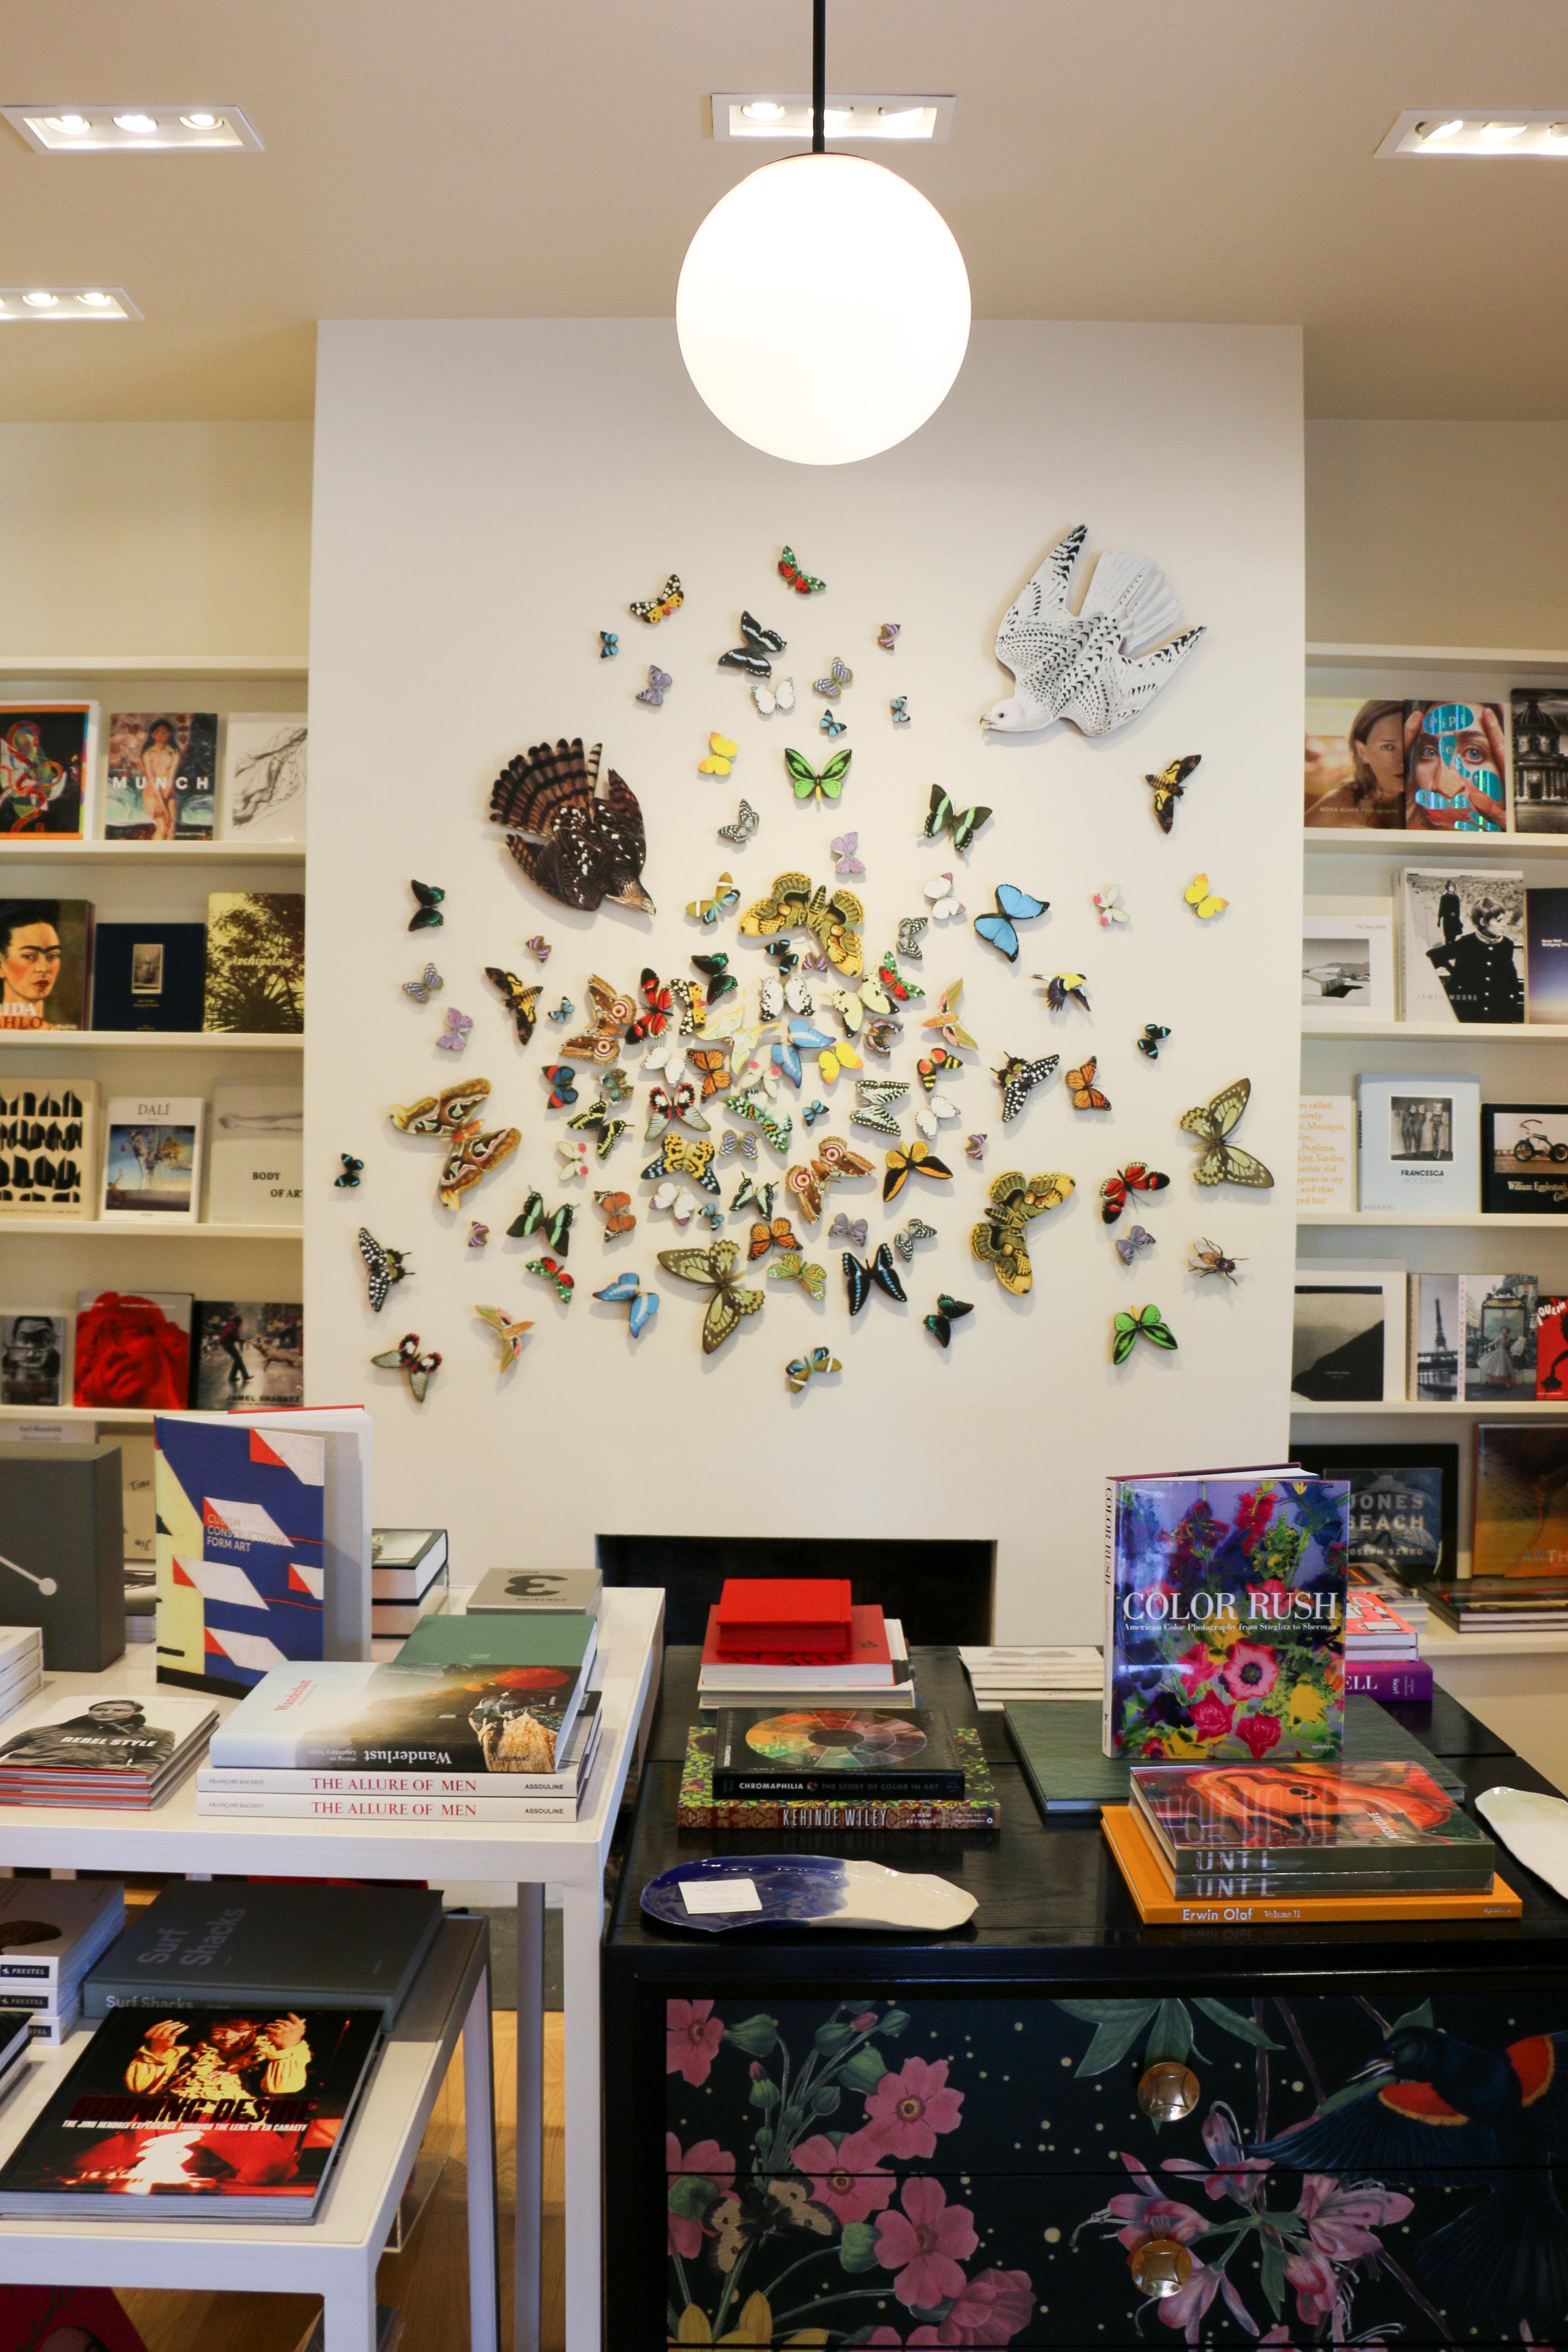 soco-gallery-bookshop-butterfly-wall-charlotte-nc